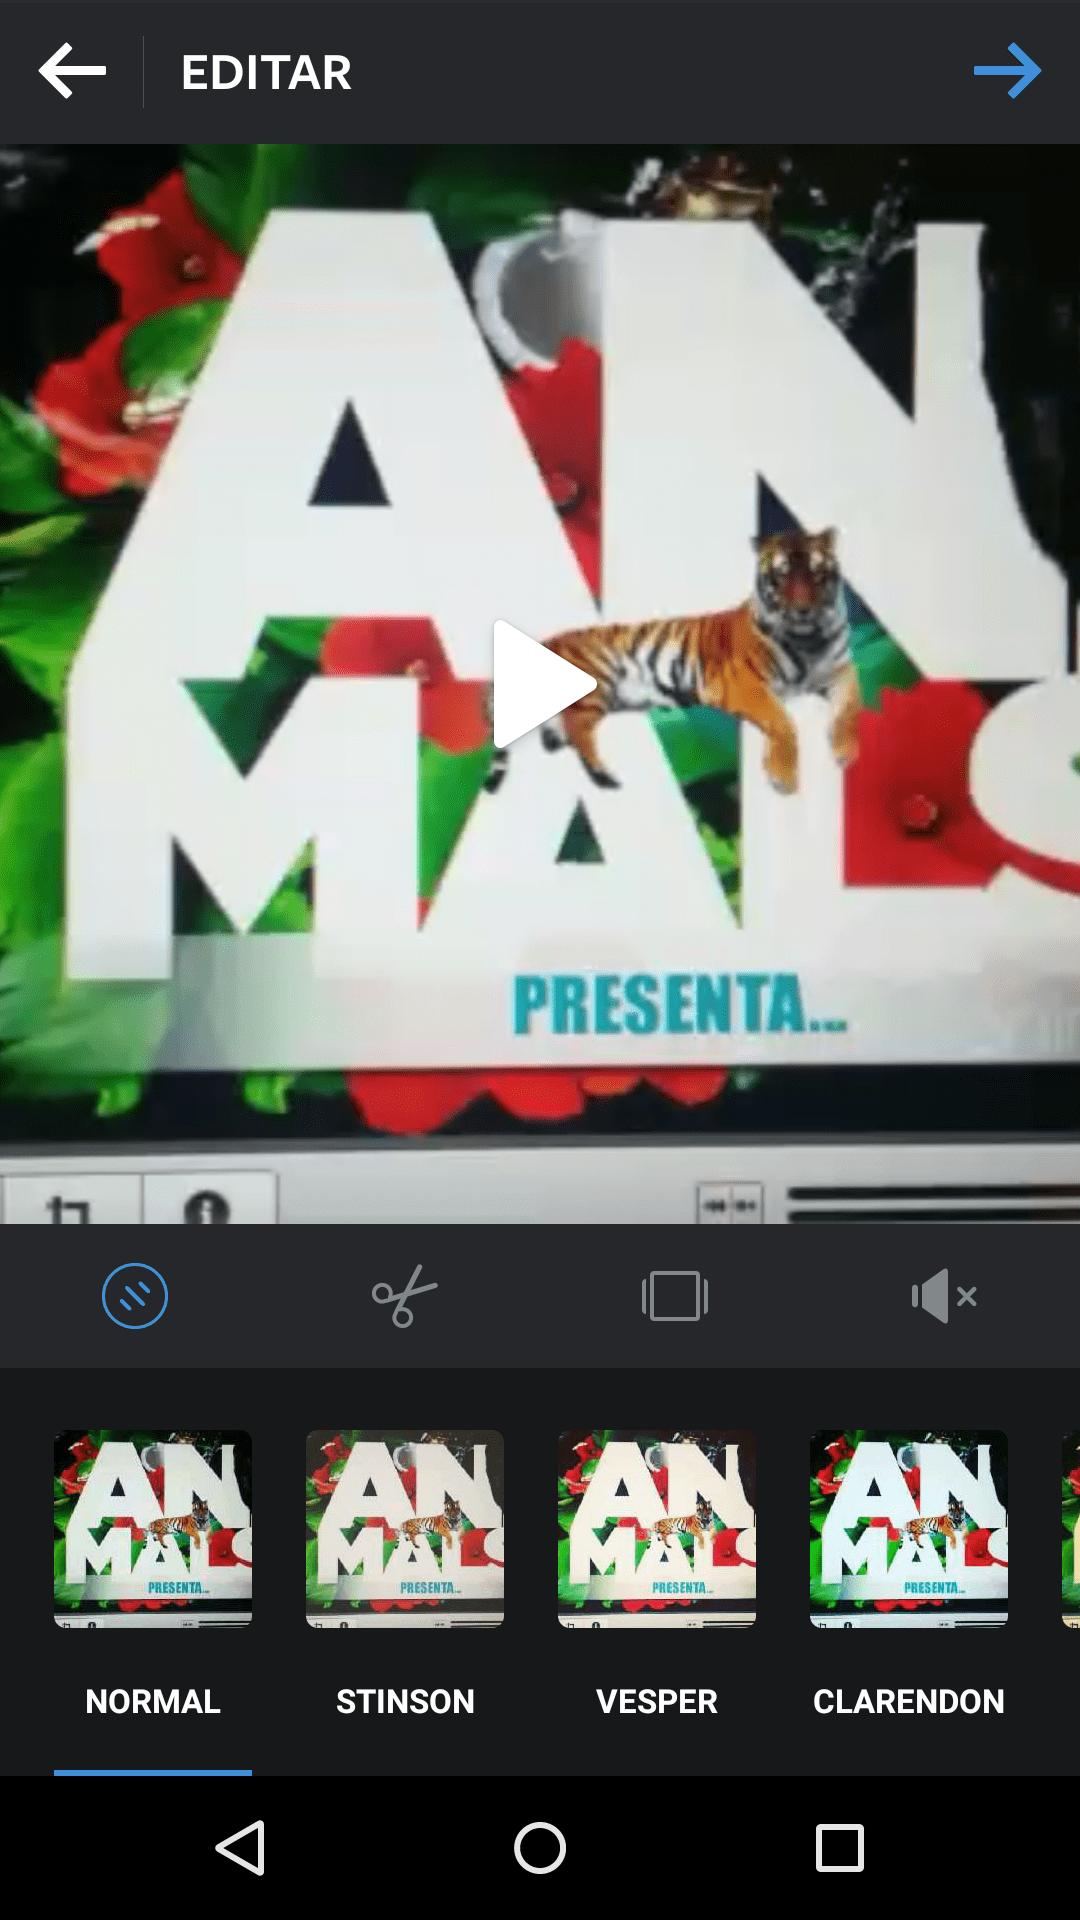 editar-videos-instagram-filtros